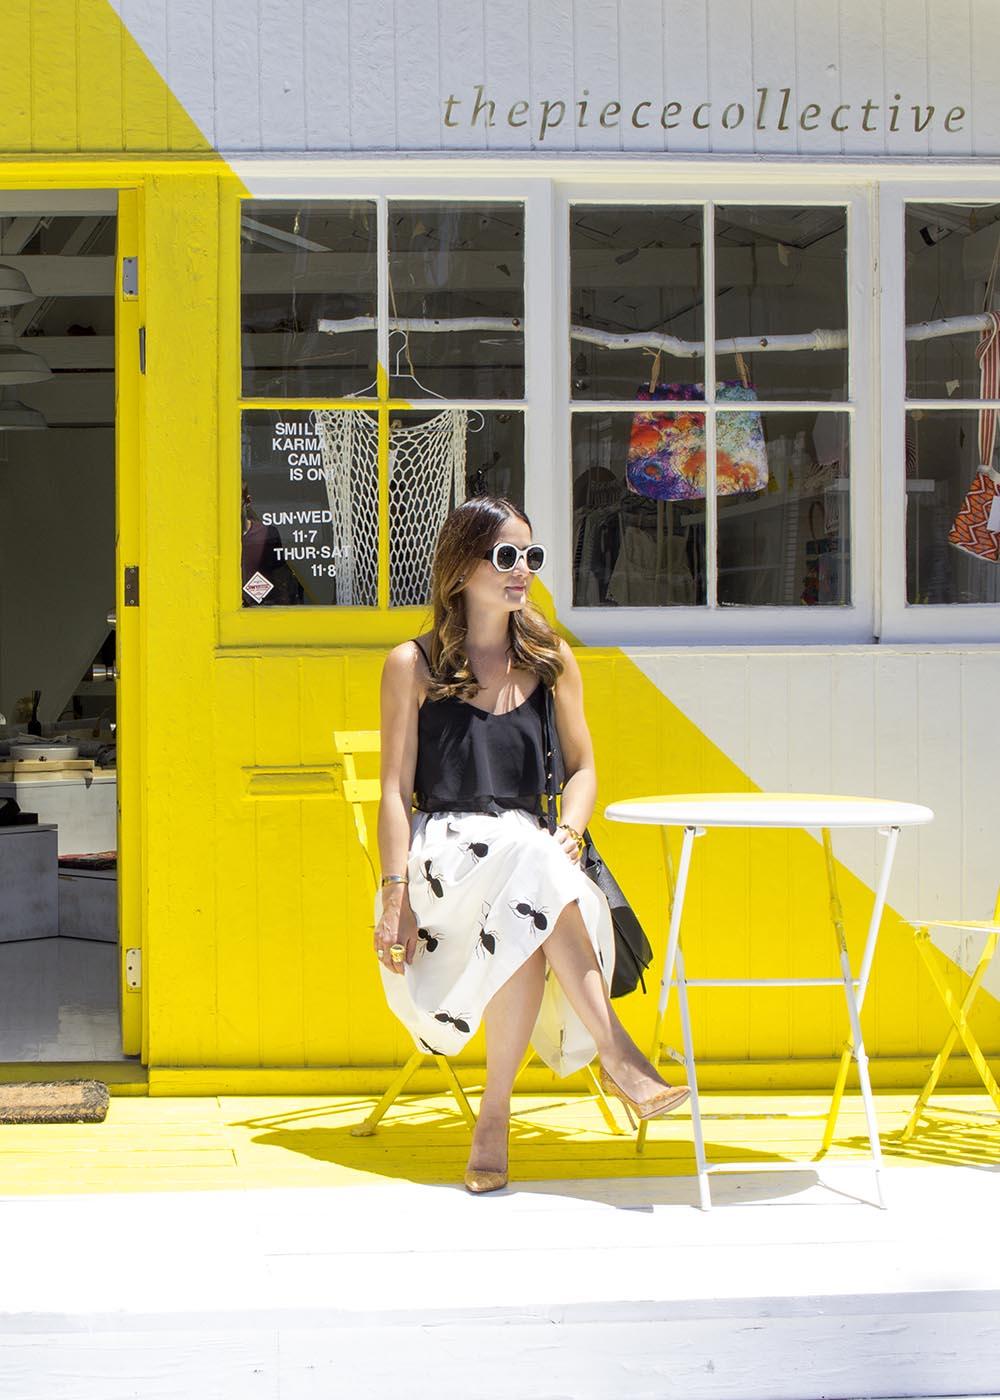 Venice Beach Yellow White Building